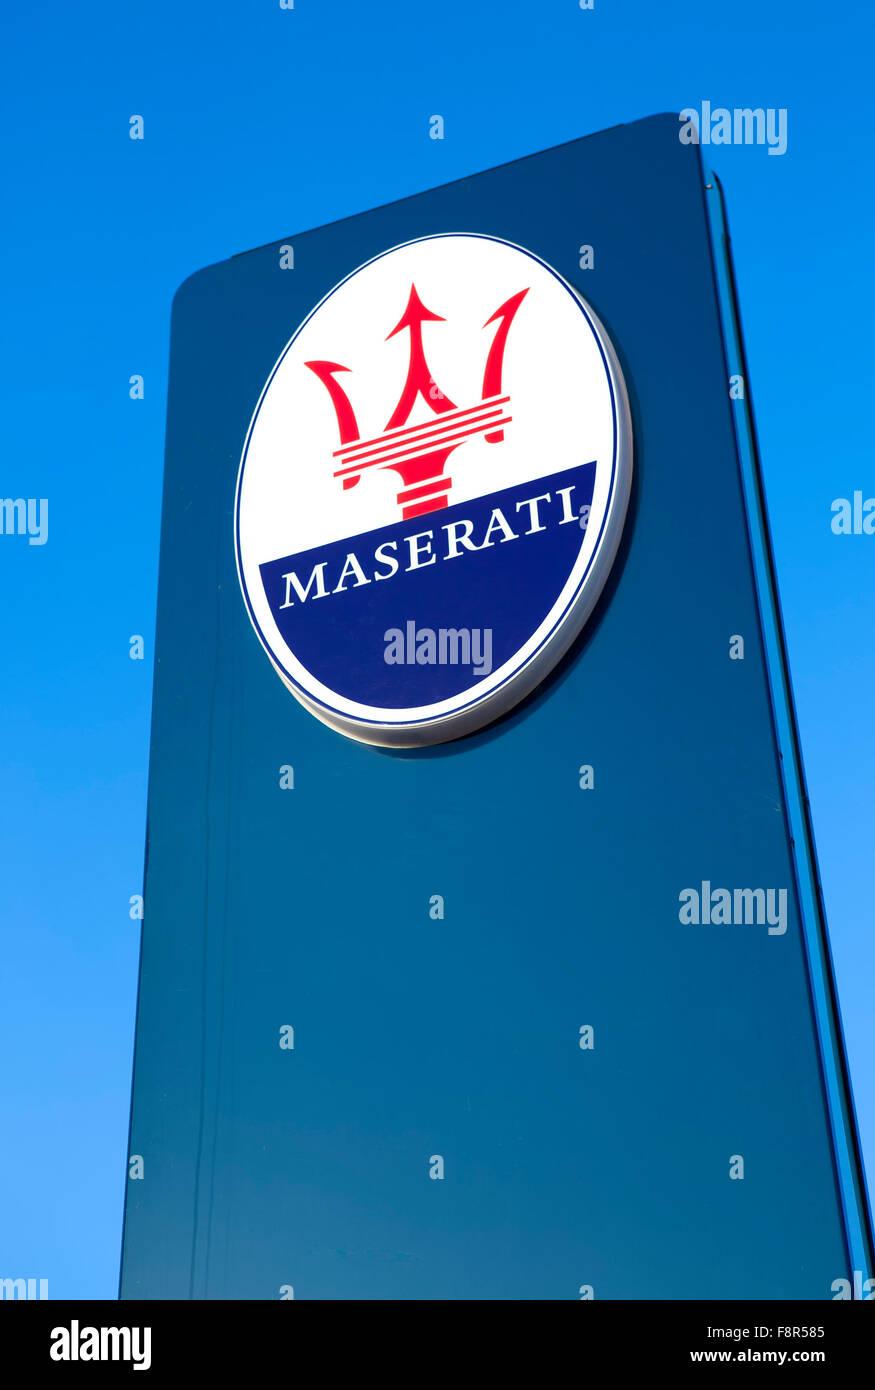 Maserati Sign Outside Car Dealership against a blue sky showing the logo of the Italian sports car producer 'Maserati' - Stock Image